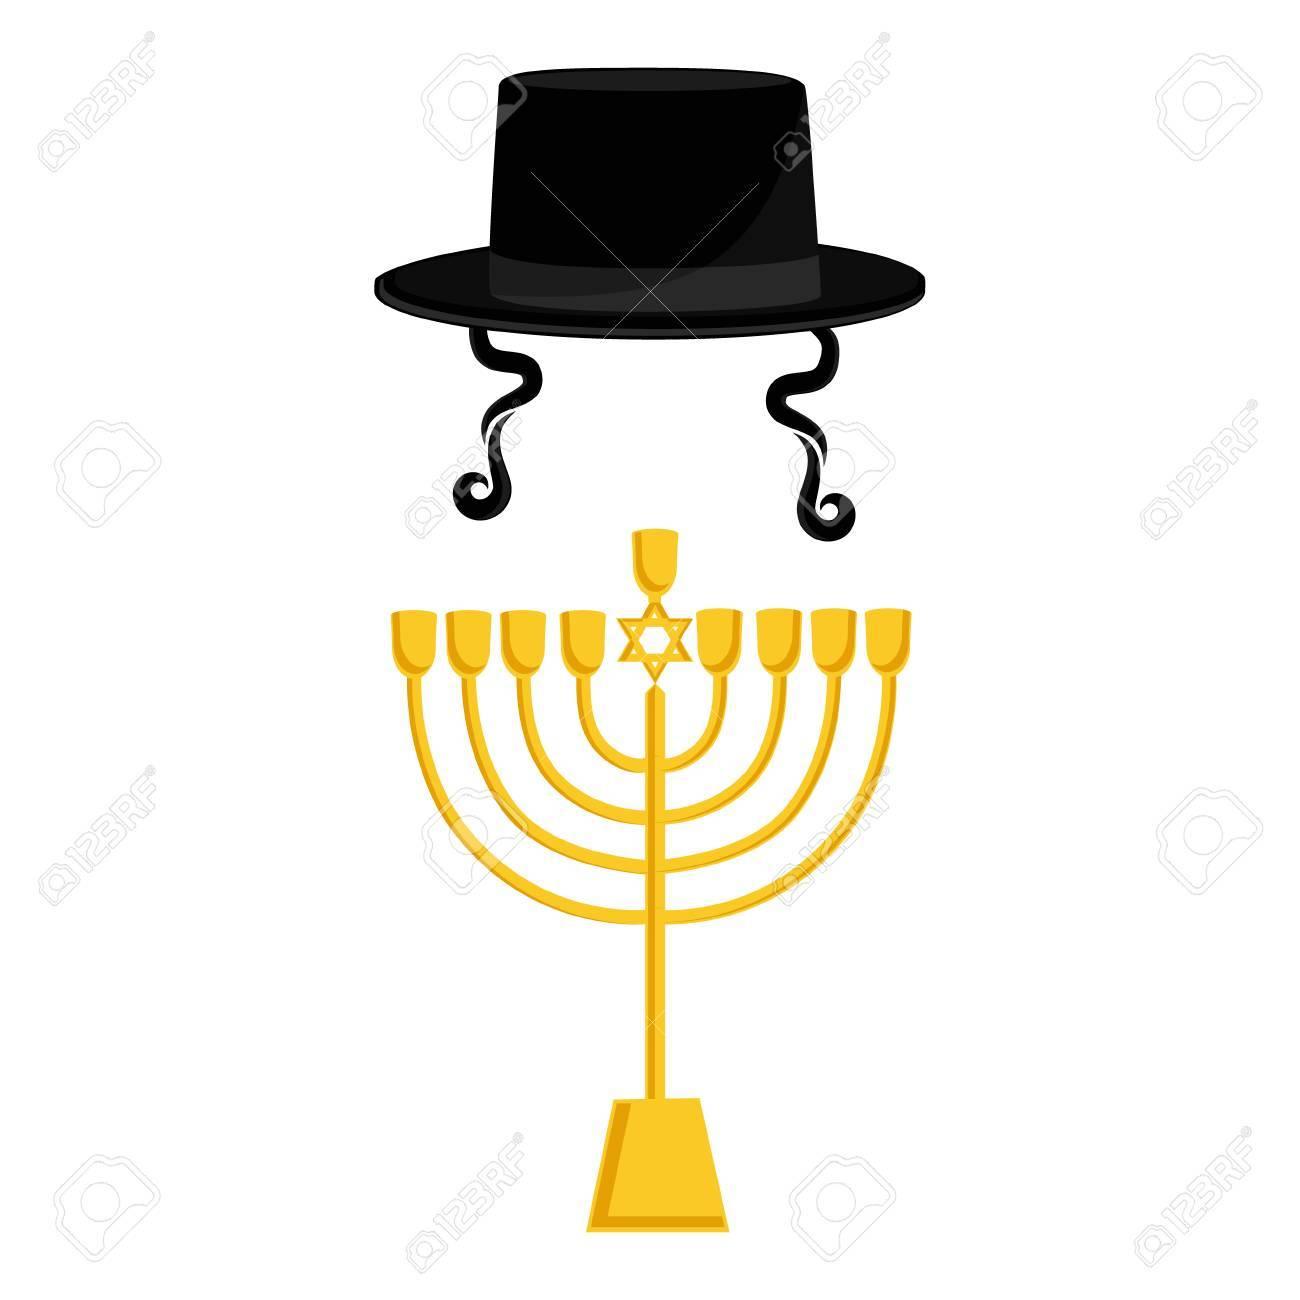 Raster illustration golden menora or menorah usually used at judaism symbols raster illustration golden menora or menorah usually used at hanukkah celebrations menorah with david star biocorpaavc Image collections